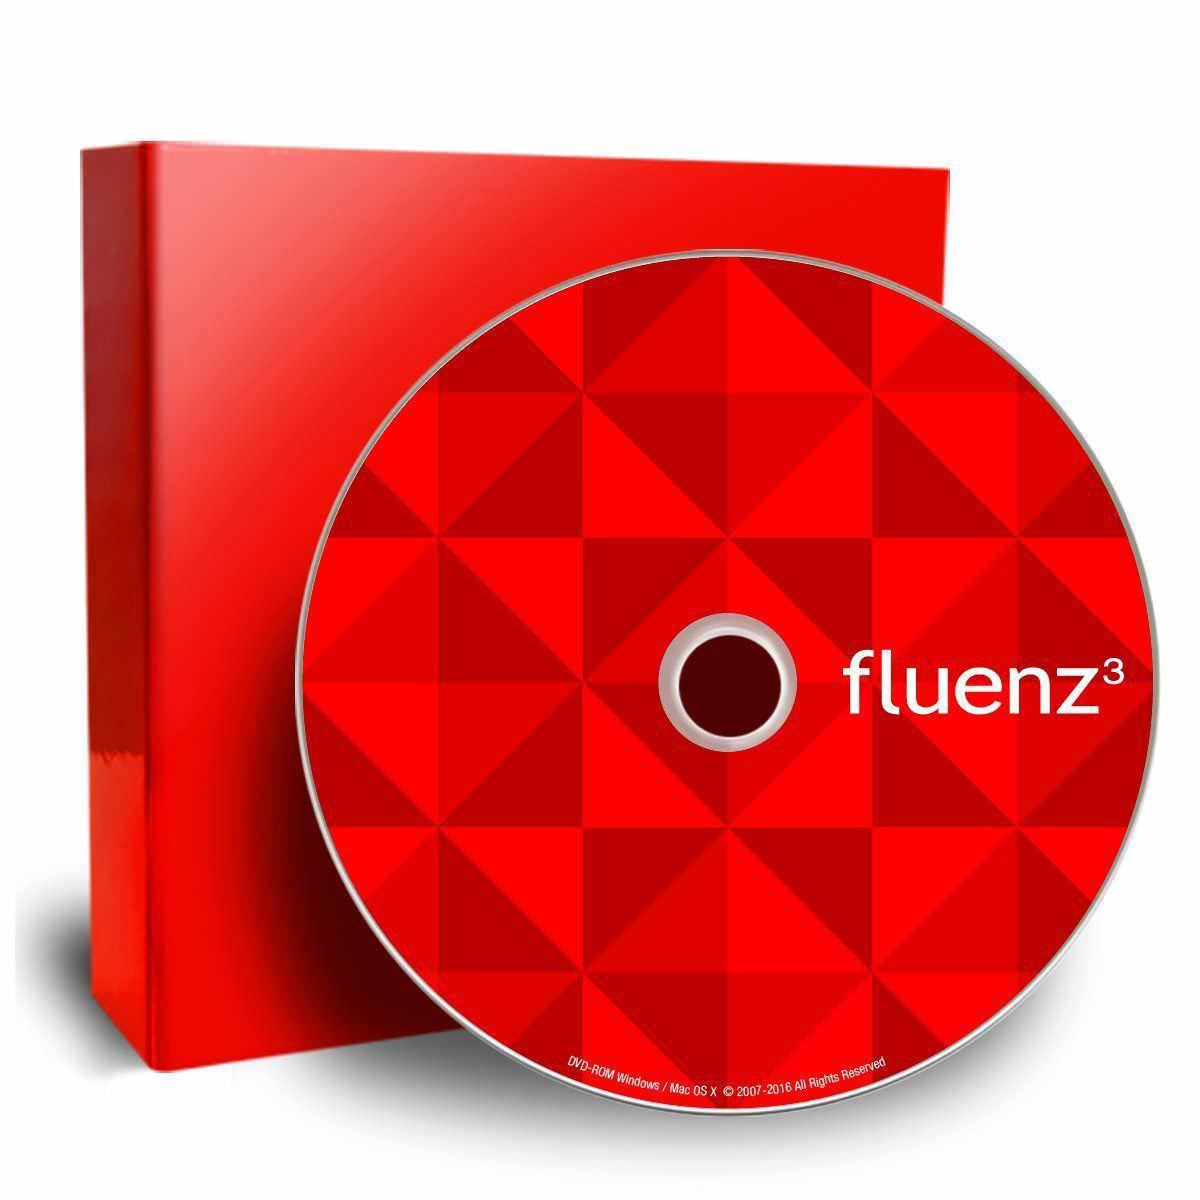 Fluenz Excellent But Expensive Language Learning